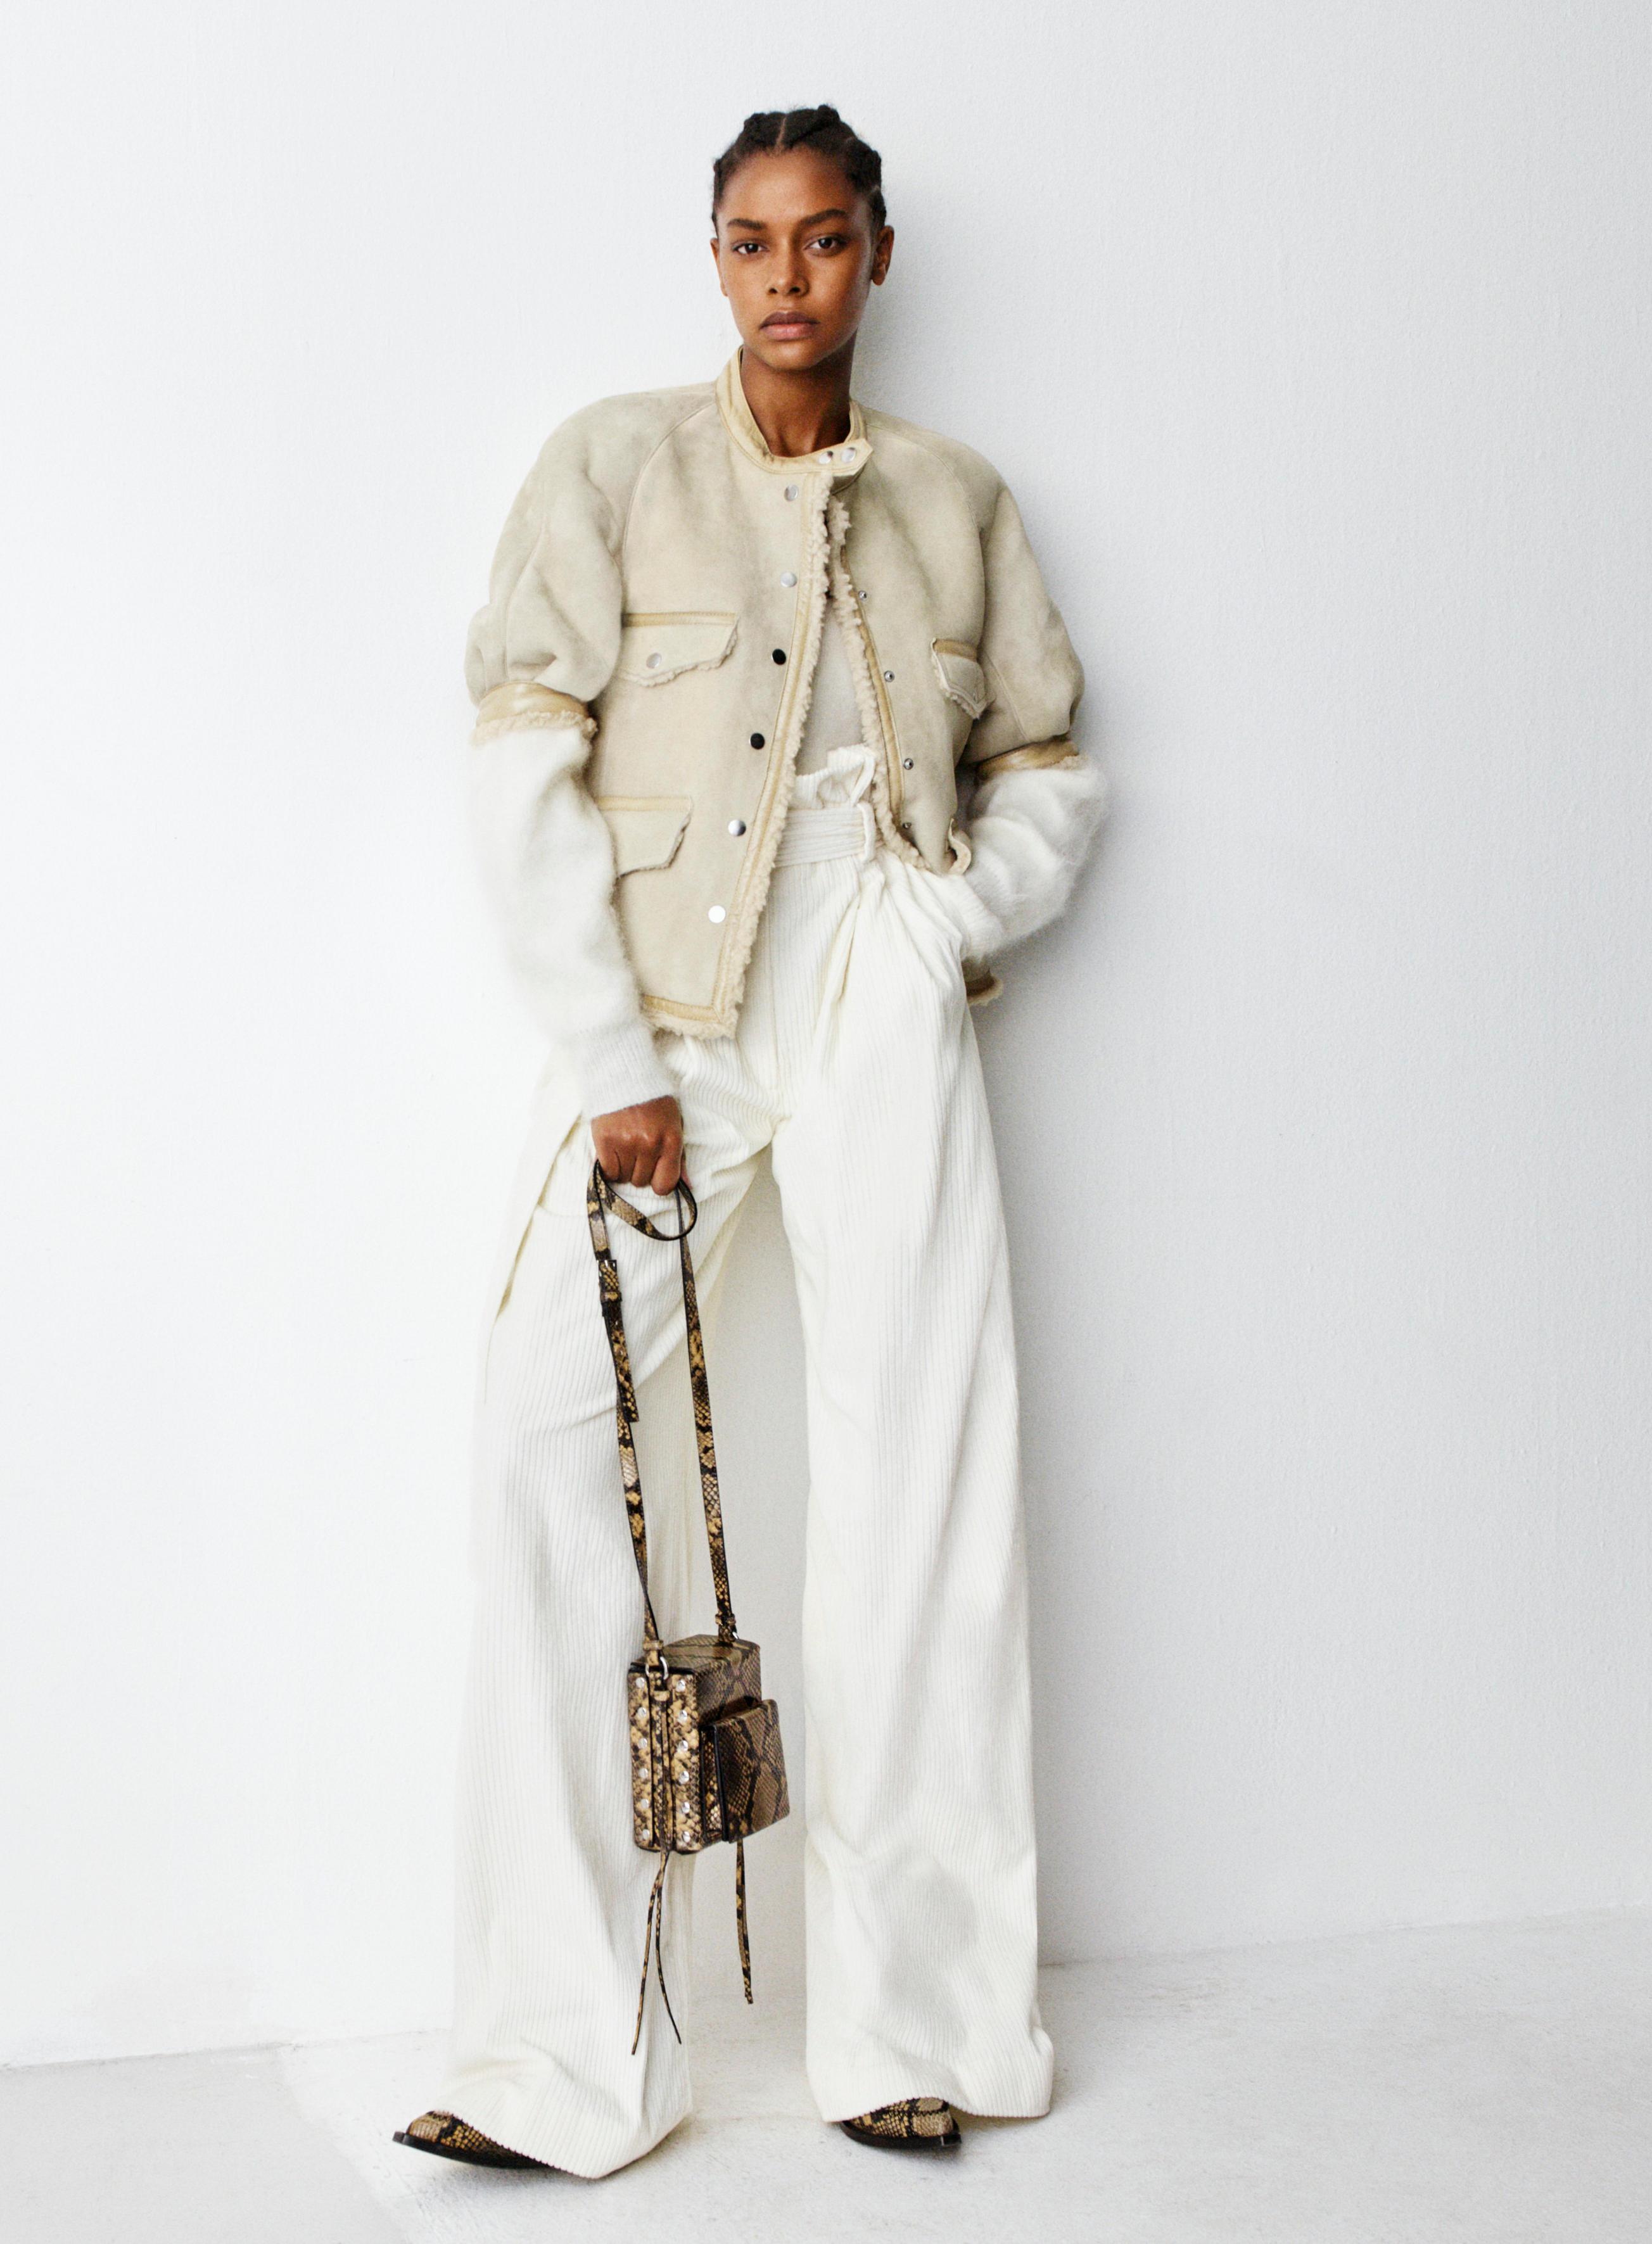 H&M Studio Fall Winter 2016 Women's Lookbook (5)